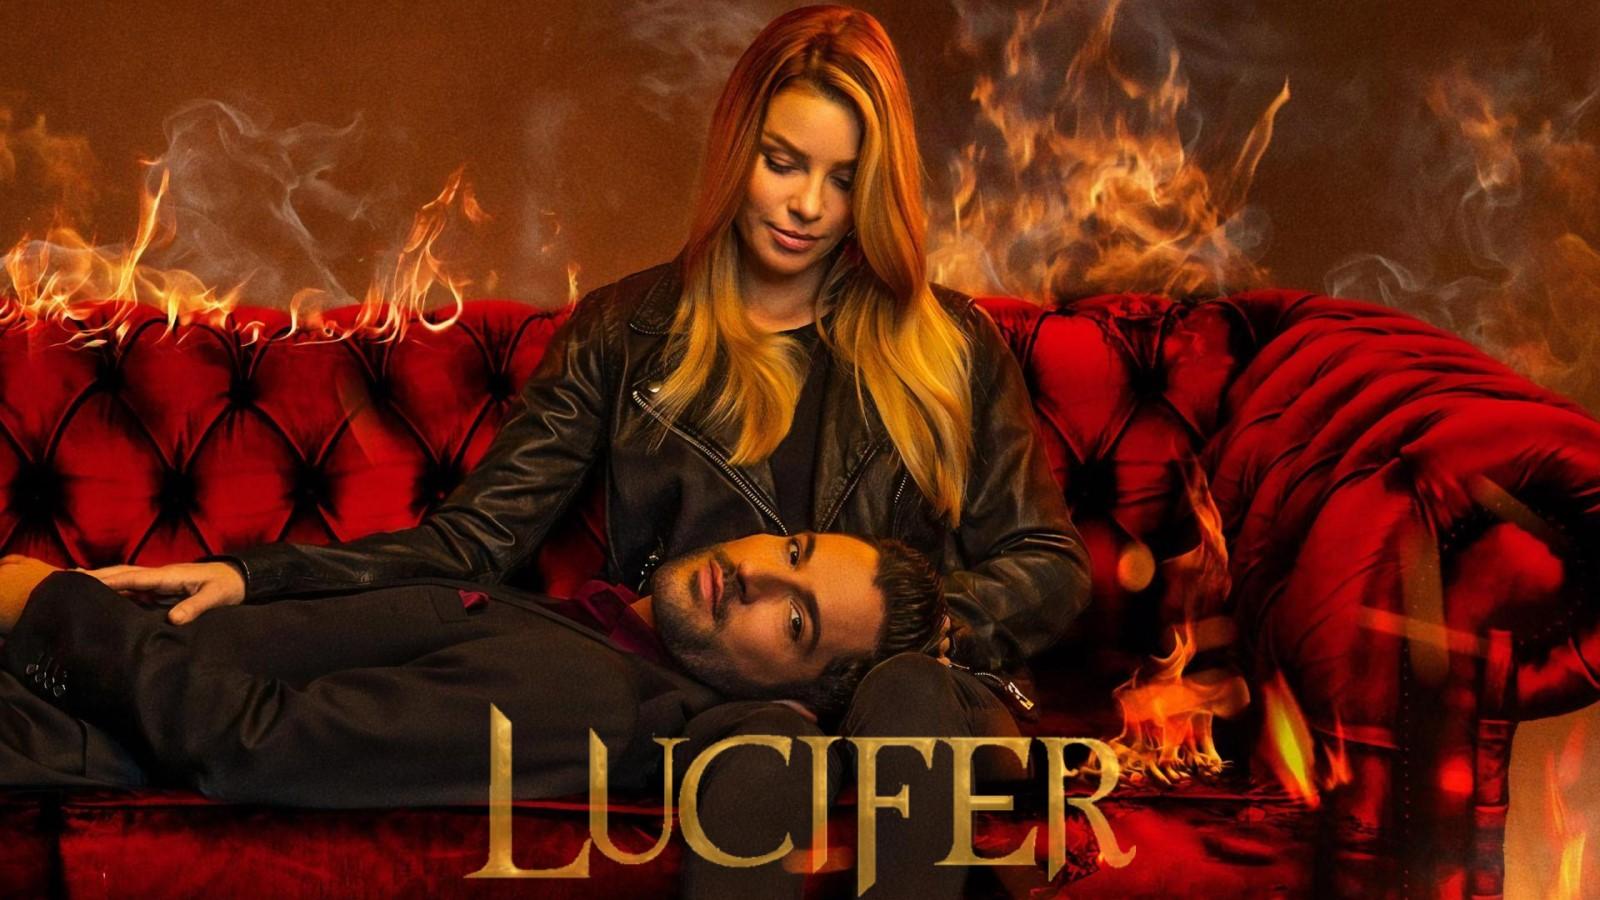 How To Watch Lucifer Season 5 Release Date Cast Plot And Trailer Technadu